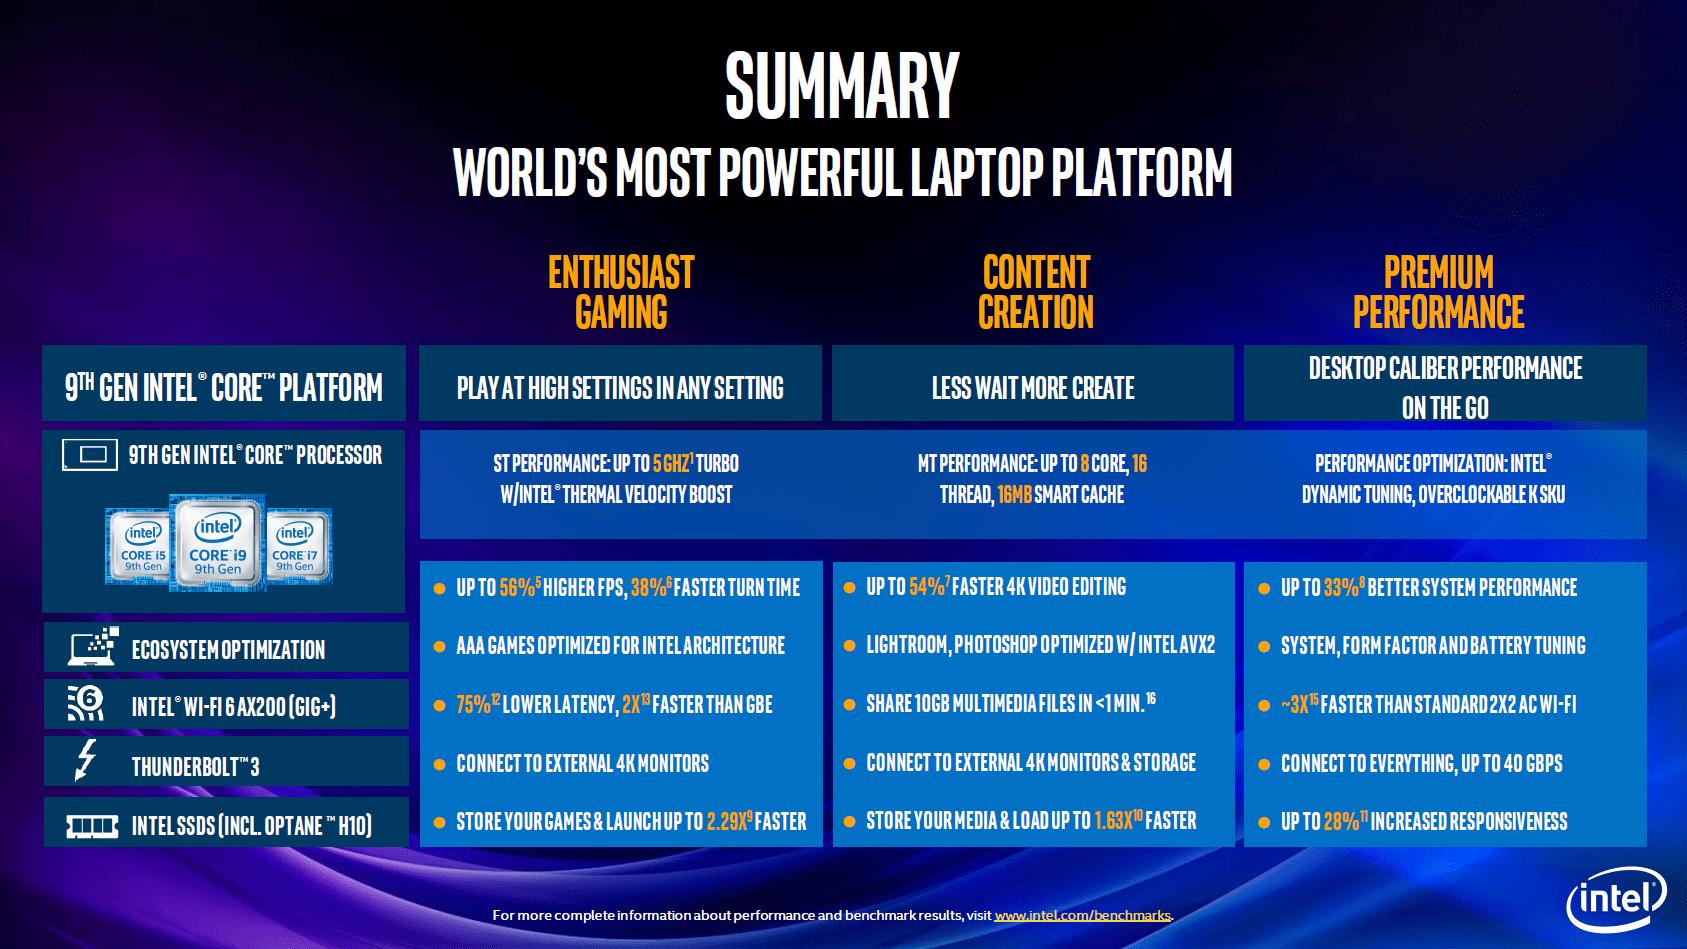 Intel CFL-H Refresh Notebook